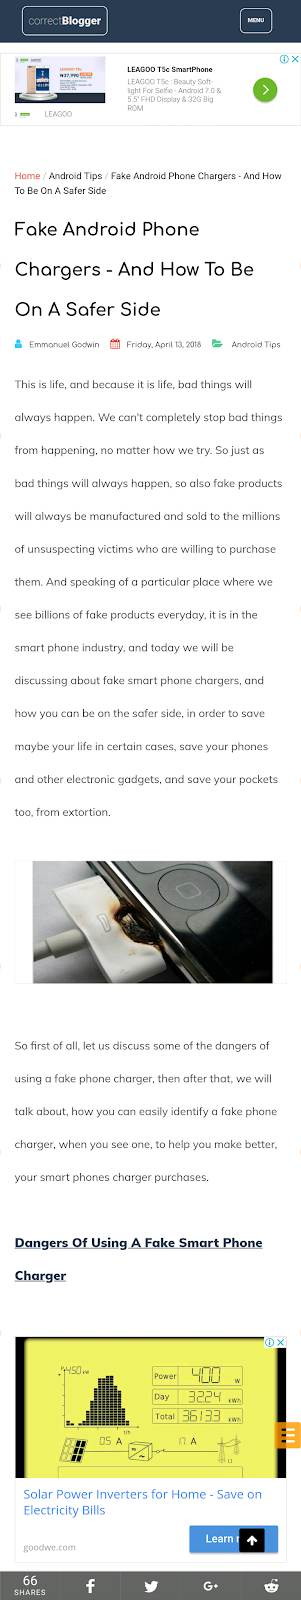 Samsung Galaxy S9 Screenshot - scroll capture